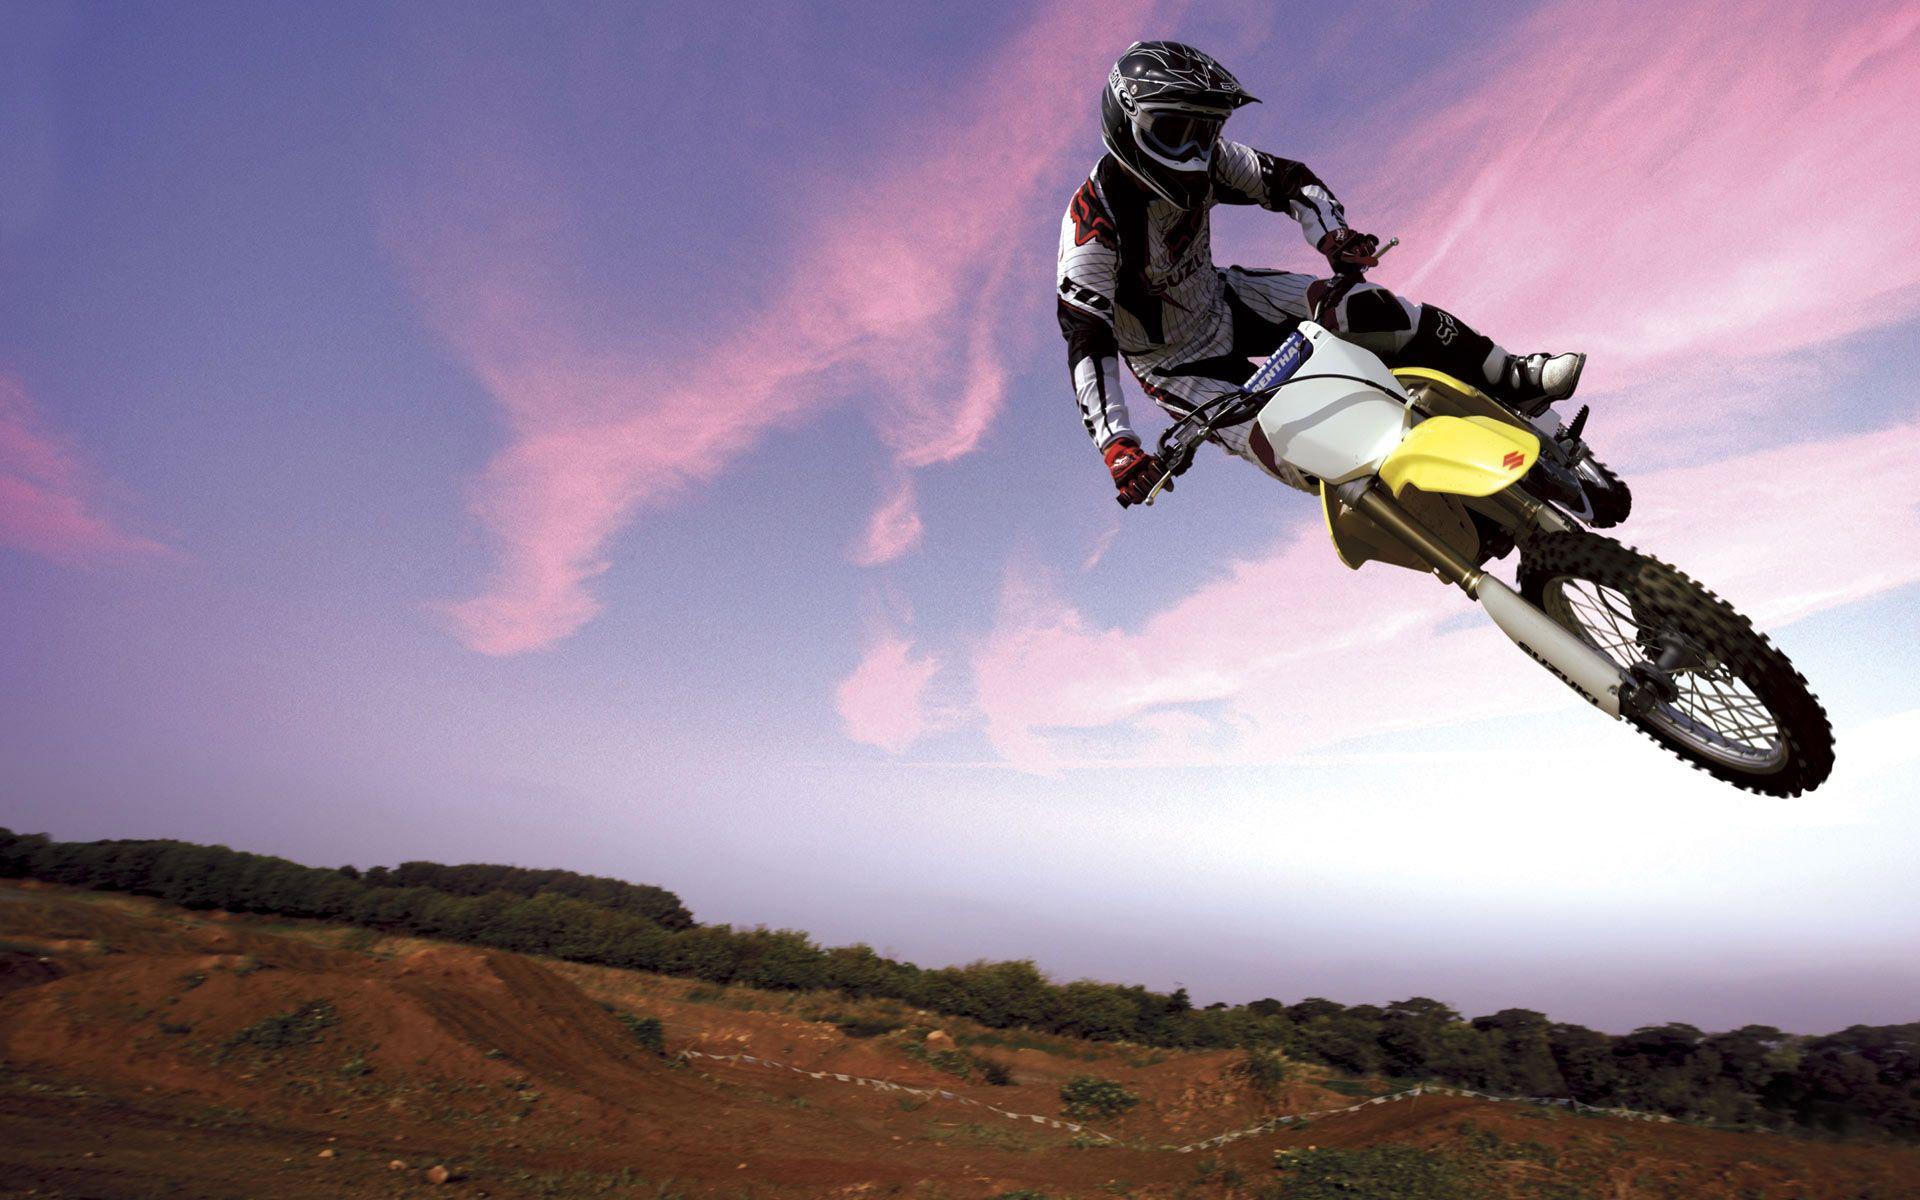 Motocross Wallpapers Backgrounds 17879 Full Hd Wallpaper Desktop With Images Suzuki Motocross Racing Motorcycles Yamaha Dirt Bikes